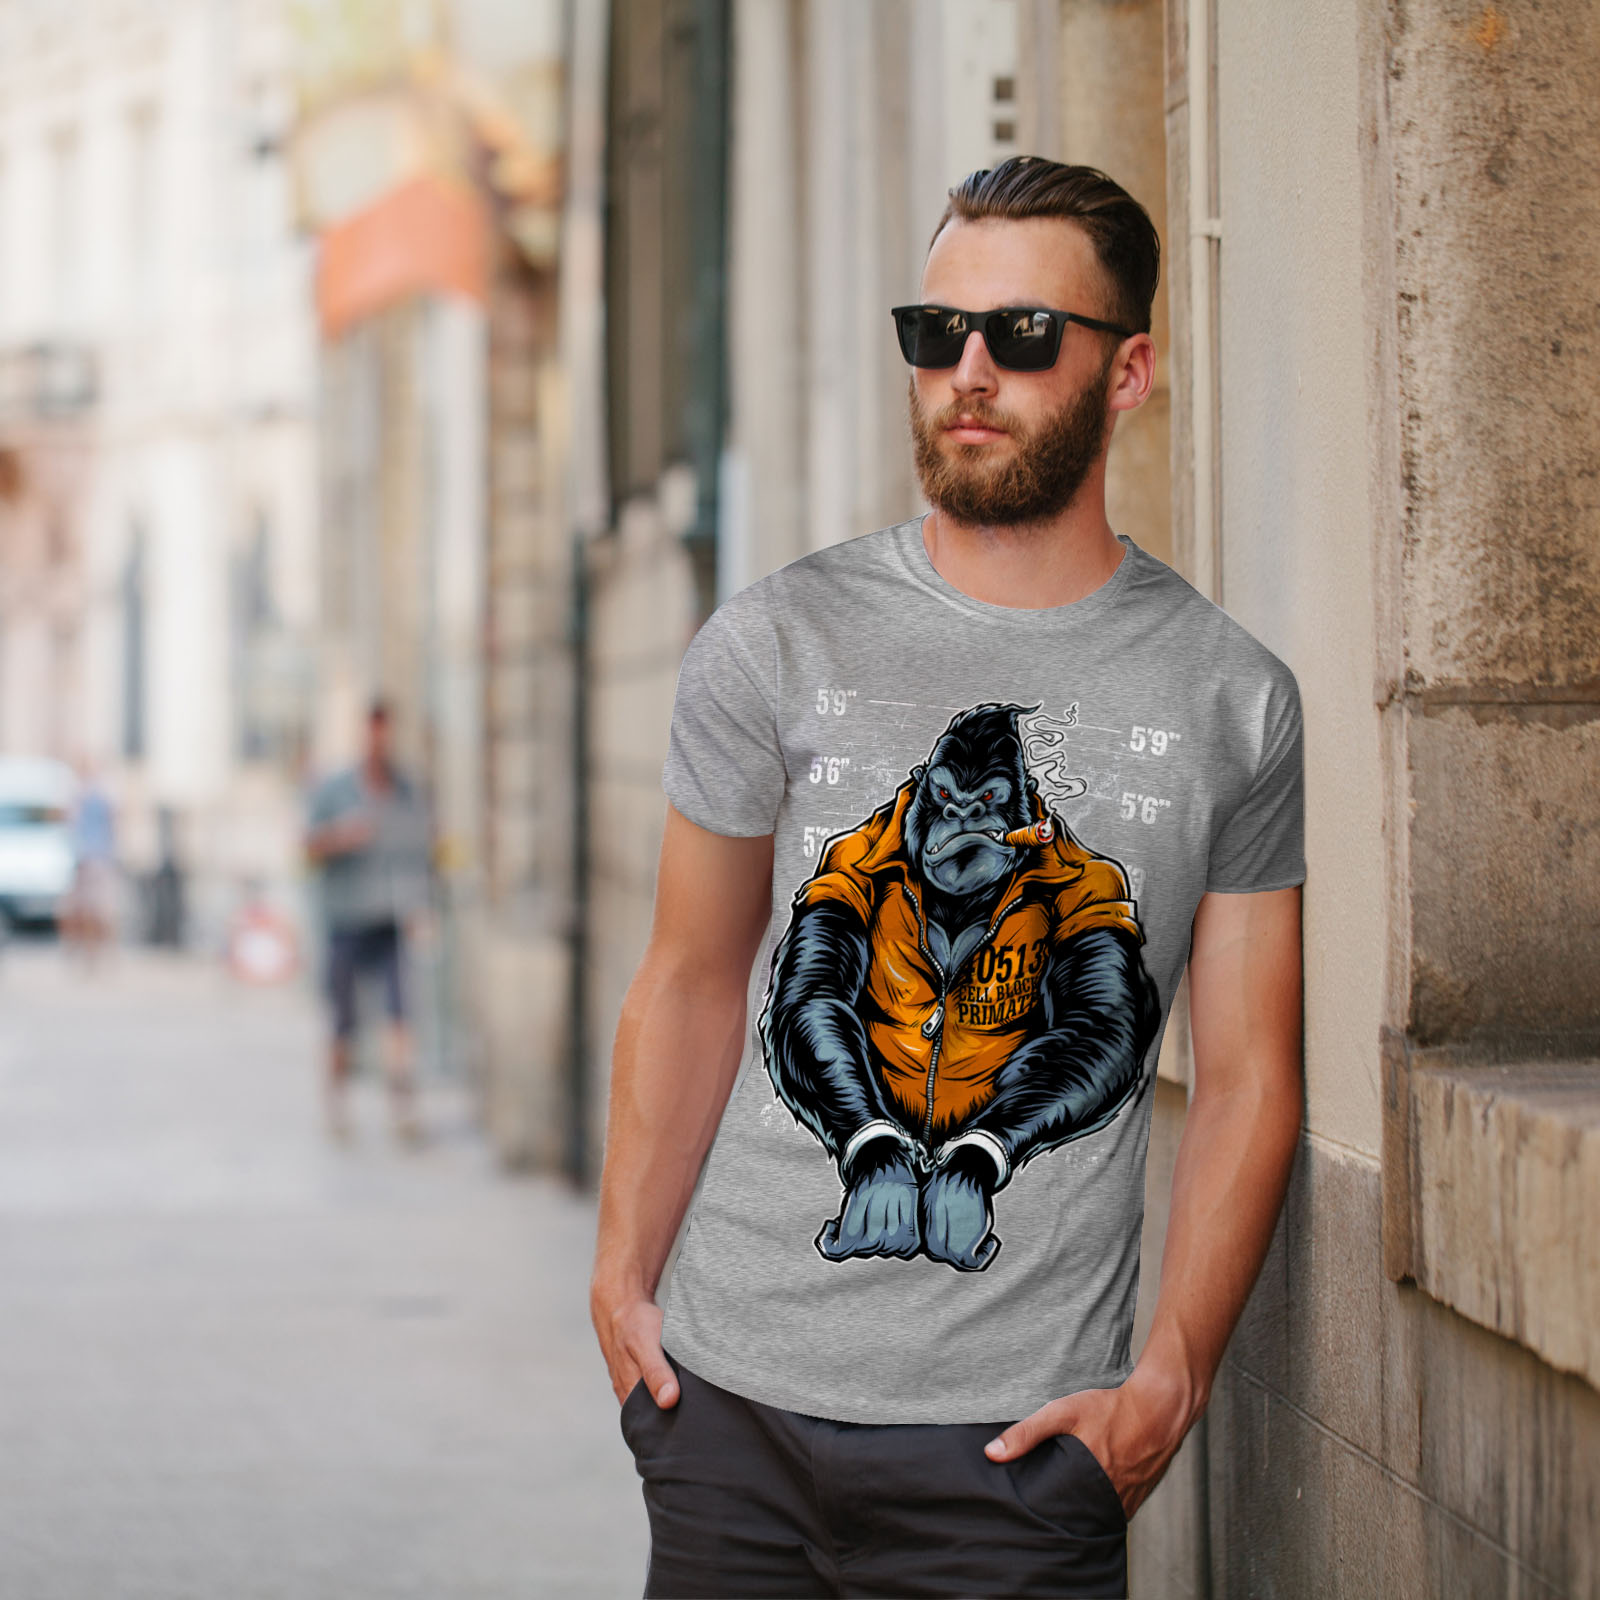 Wellcoda-Monkey-Ape-Prison-Mens-T-shirt-Wild-Graphic-Design-Printed-Tee thumbnail 17